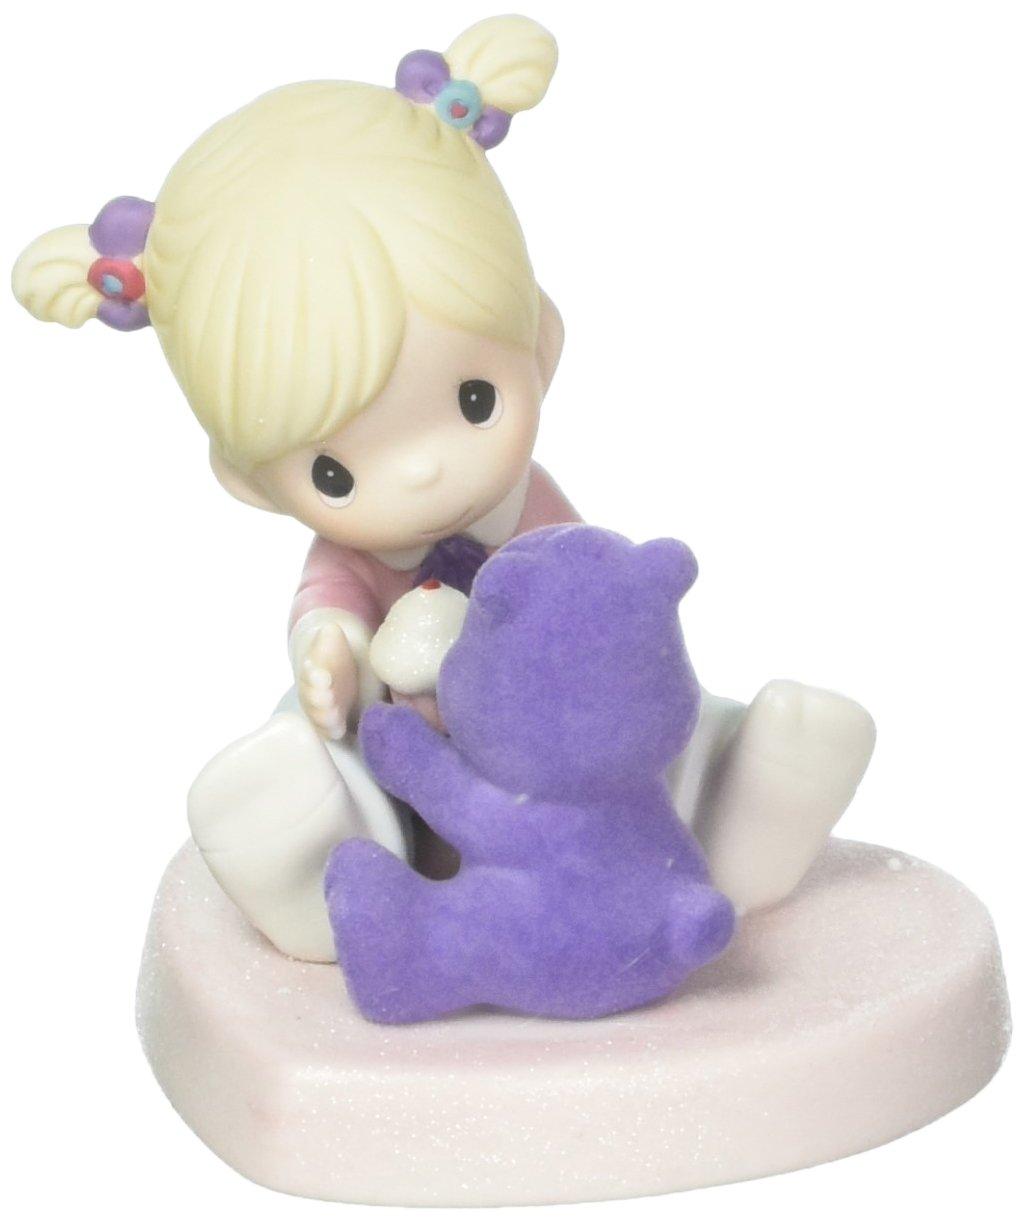 163042,Multi Bisque Porcelain Figurine Precious Moments Company 163042 Precious Moments Share a Smile Care Bears